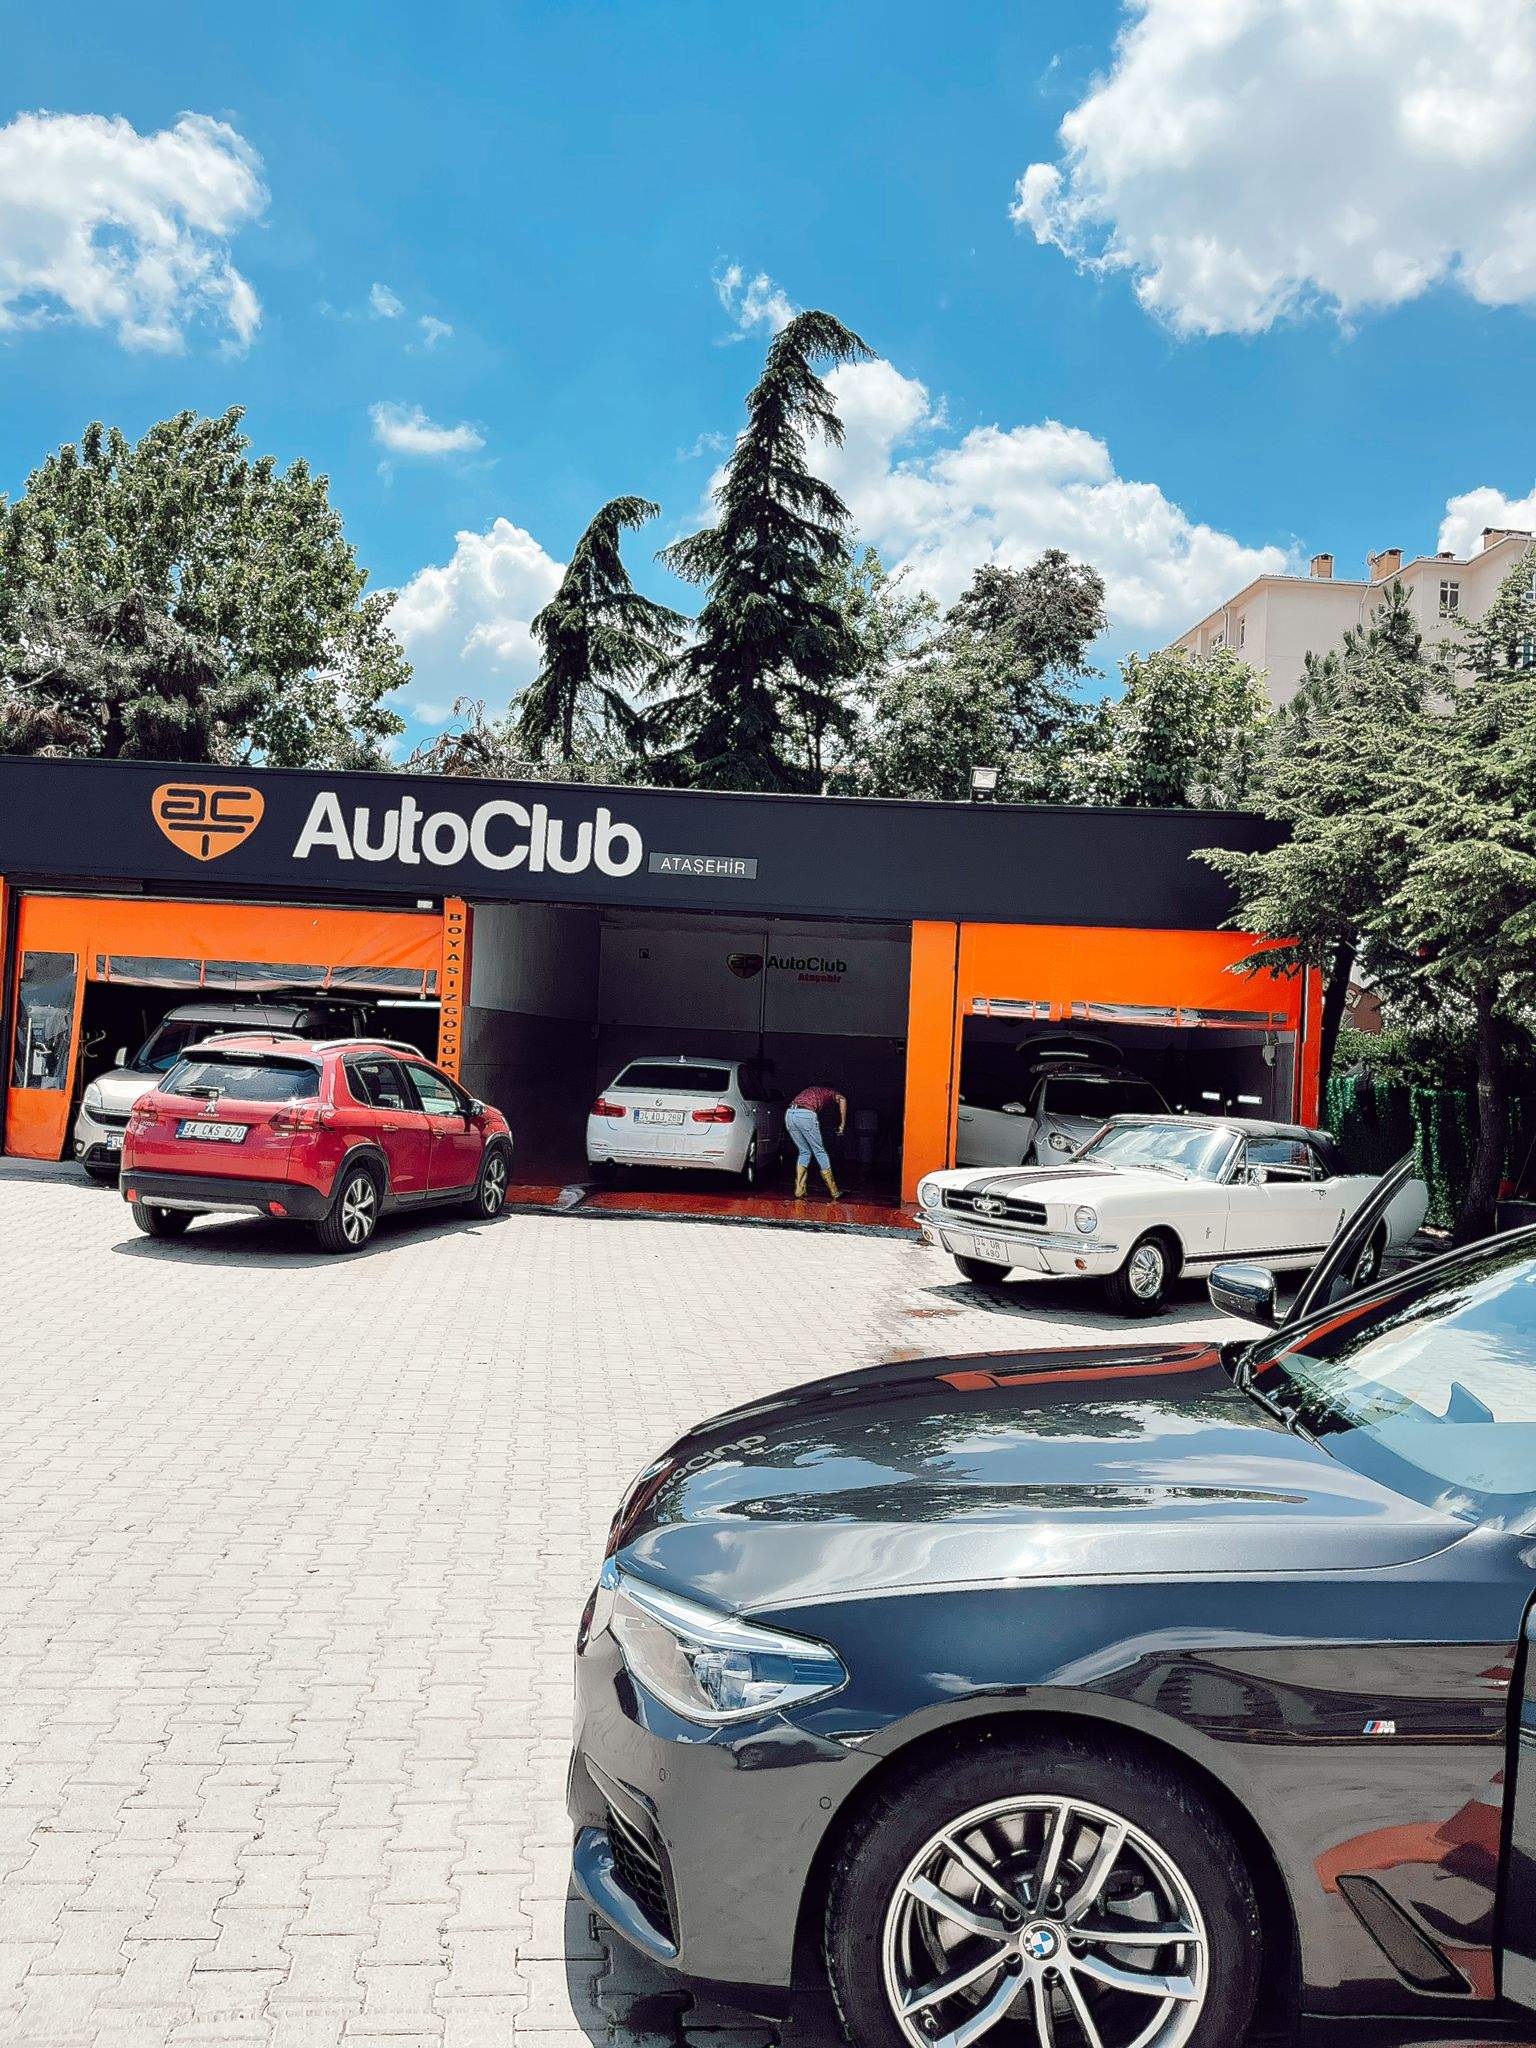 AutoClub Ataşehir - İstanbul Ataşehir